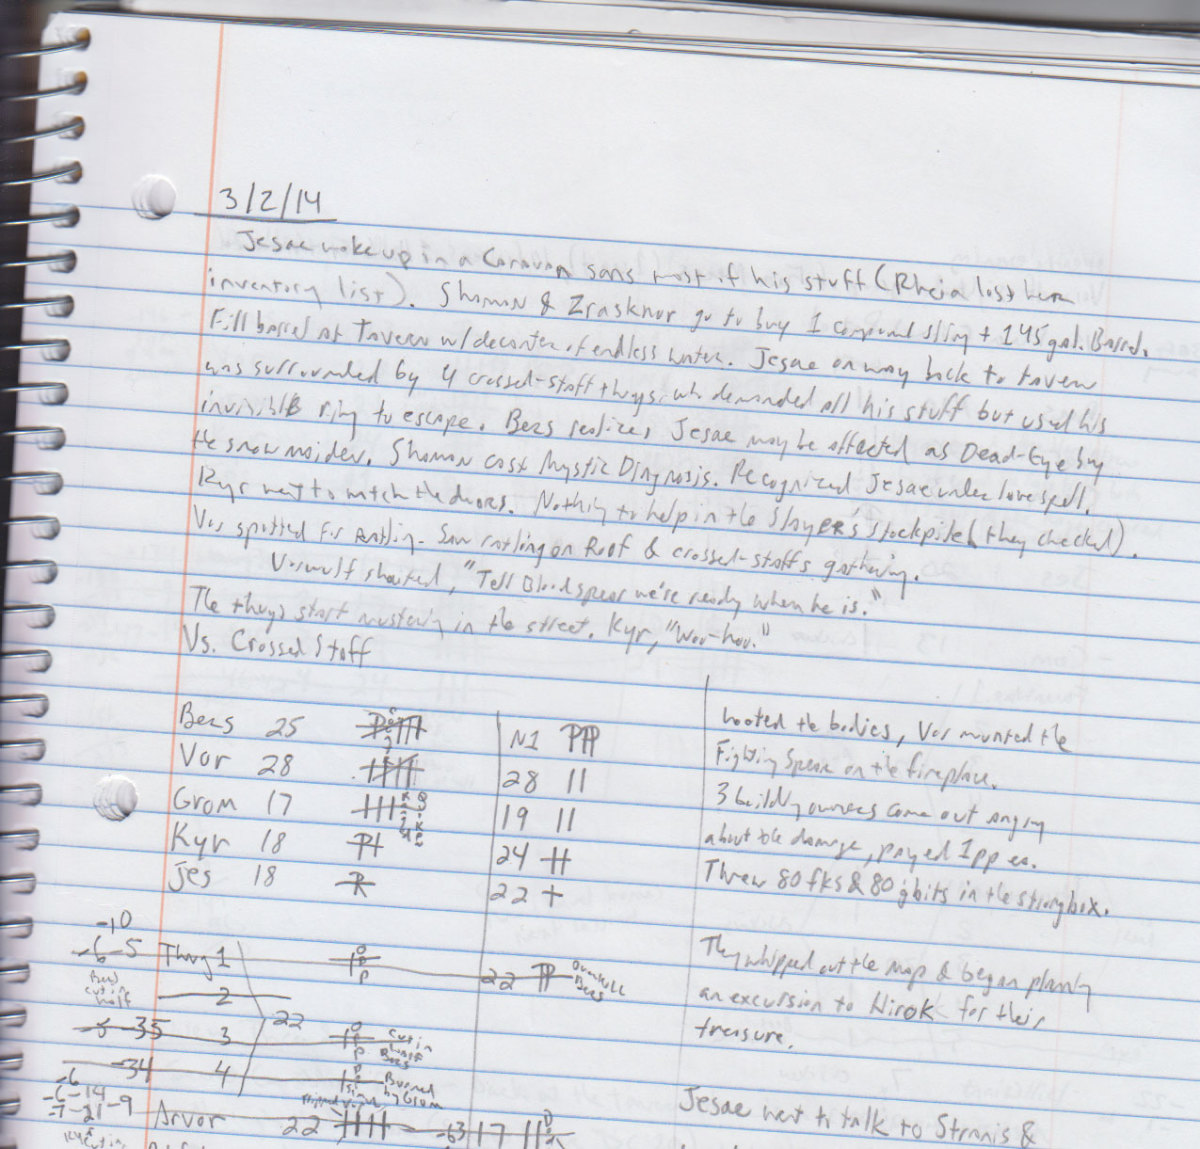 Semi-Organized Session Notes